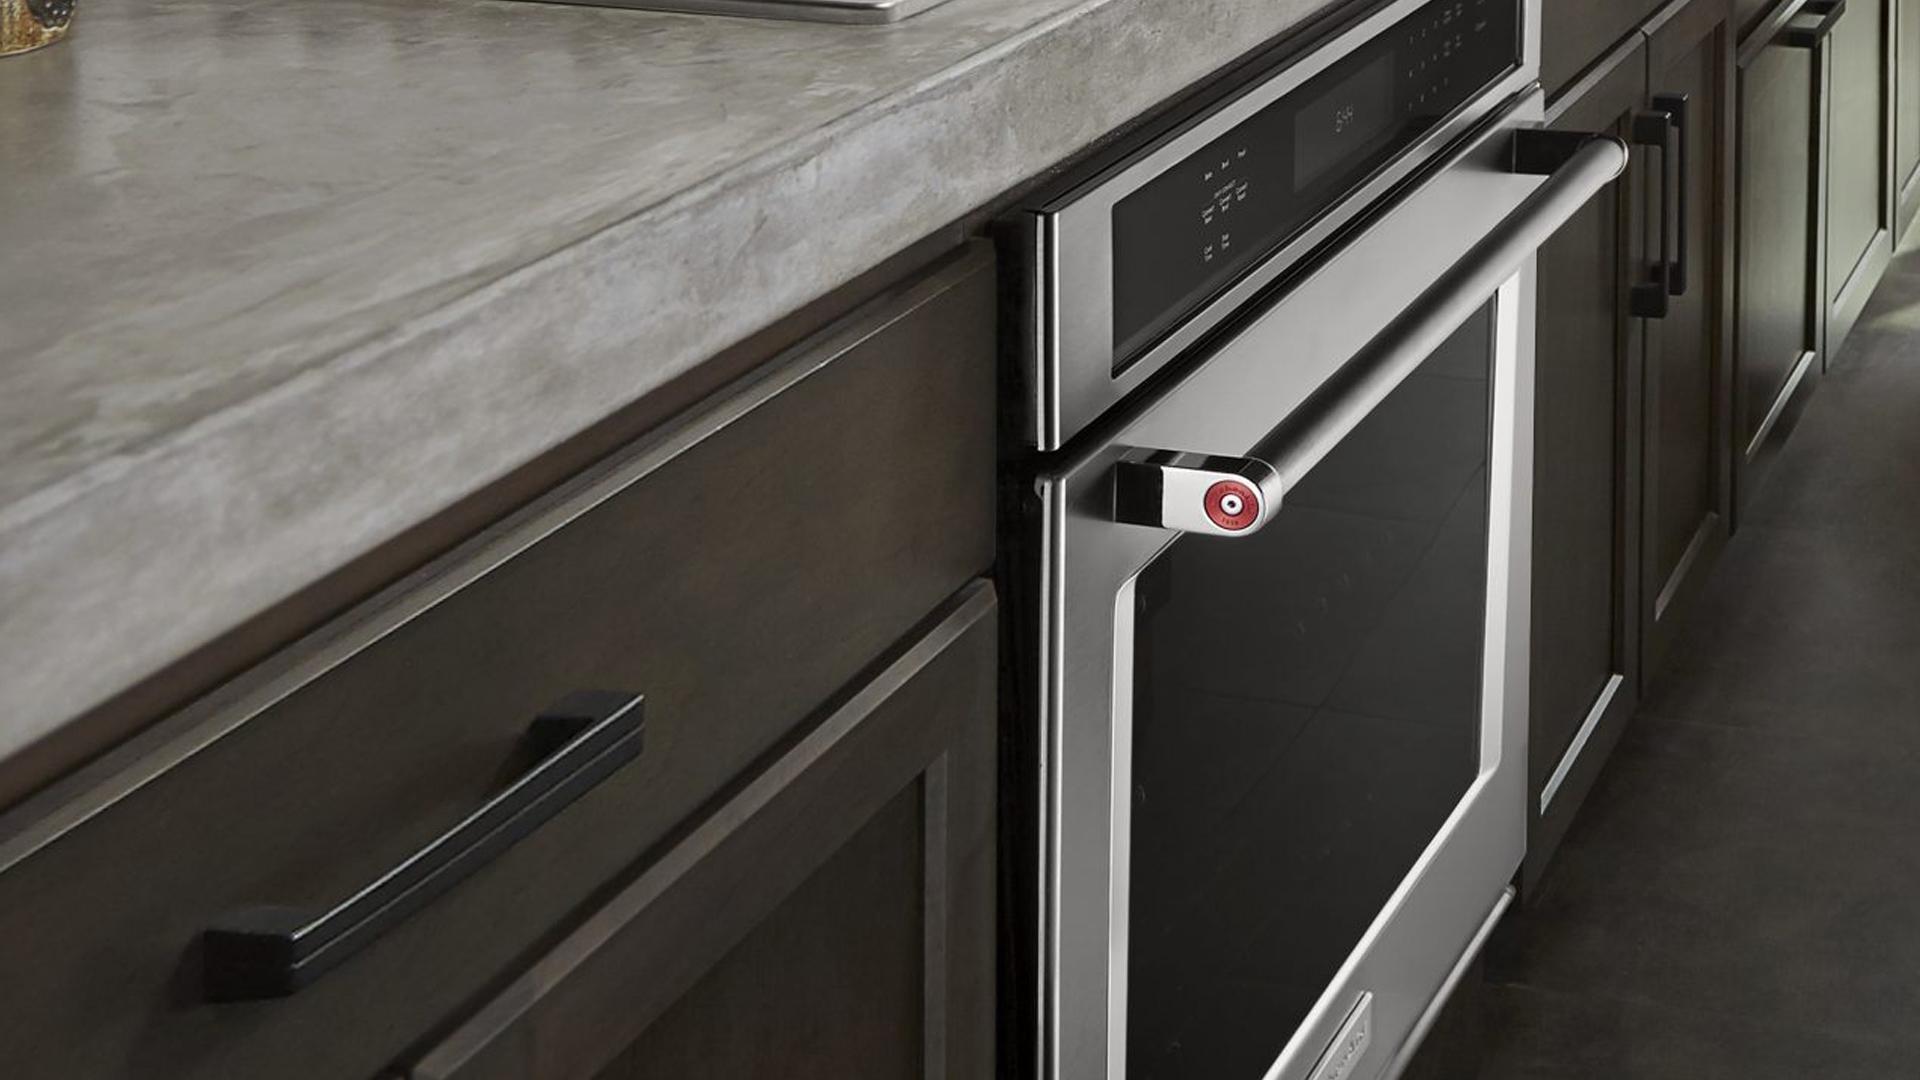 KitchenAid Single Wall Oven Repair | Kitchenaid Repairs